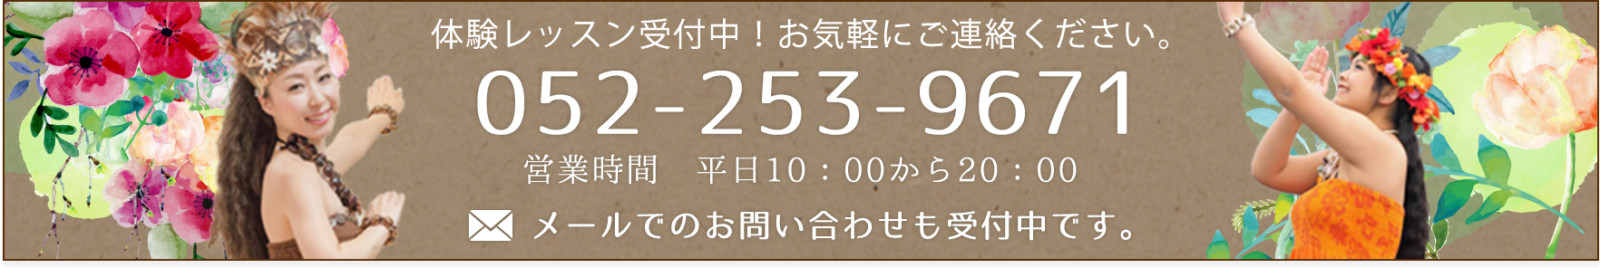 main_banner_01 RISA WEDDING | タヒチアンダンス テマラマタヒチ名古屋